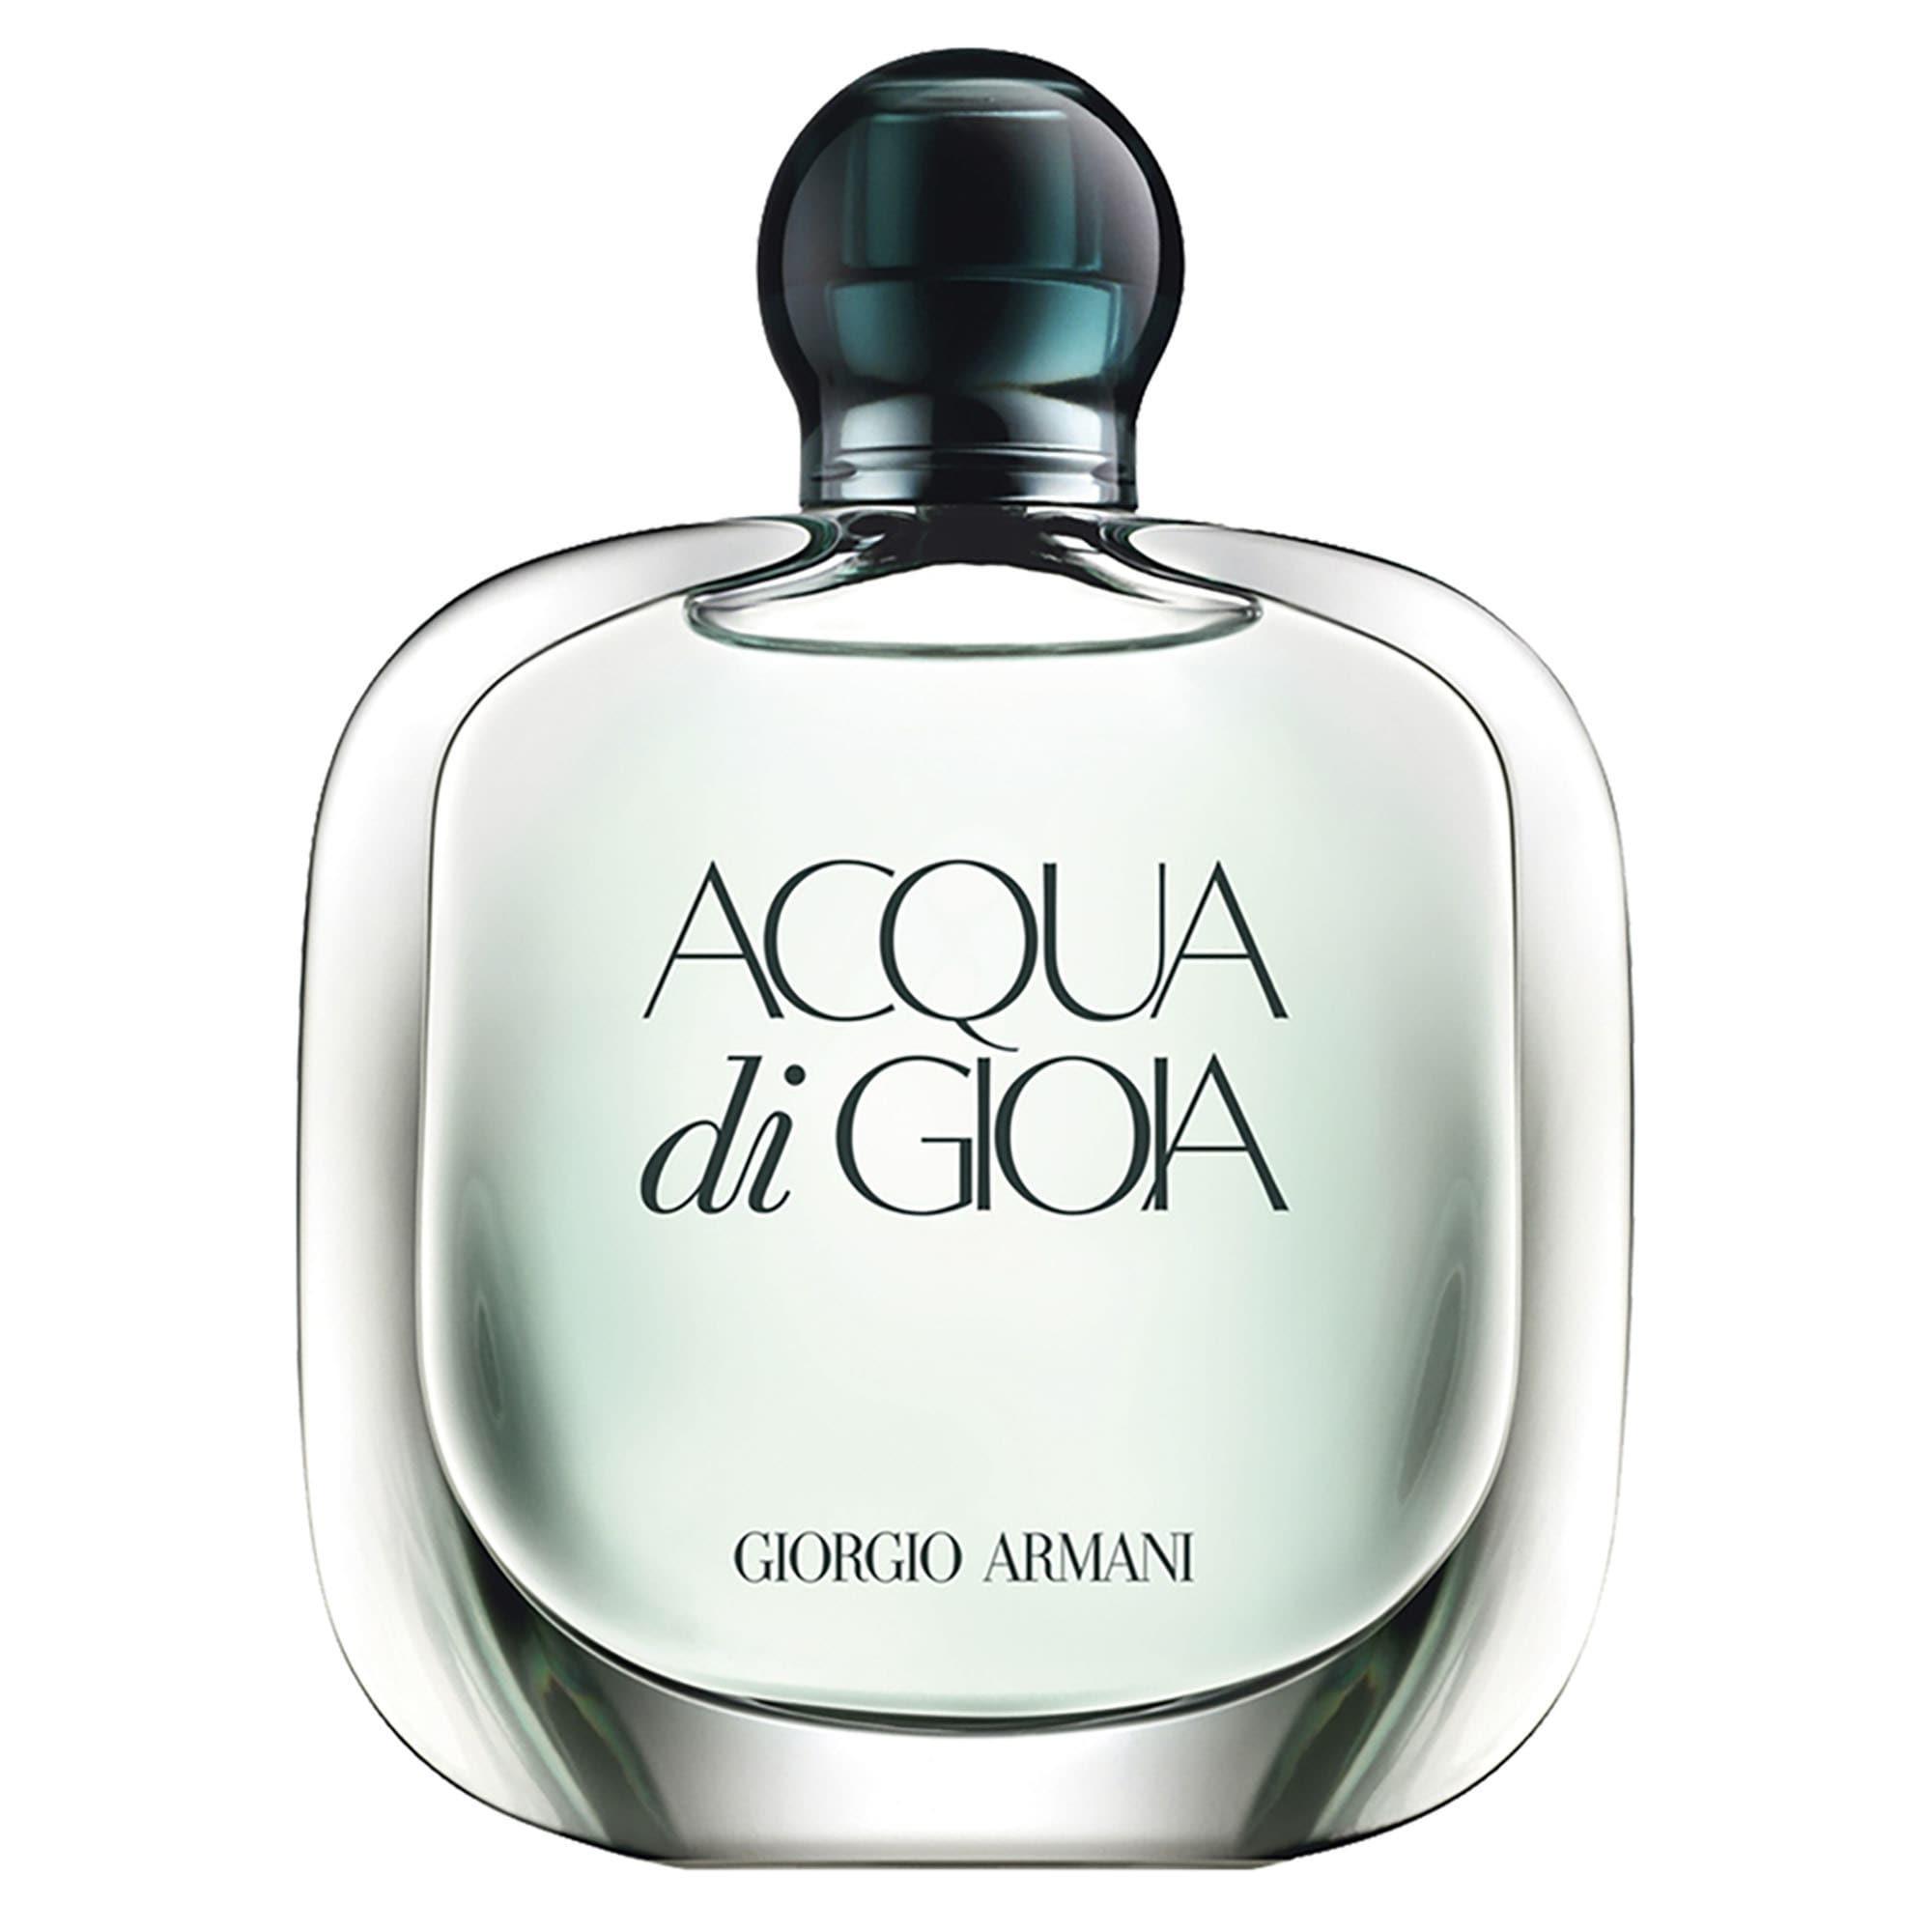 Giorgio Armani Acqua Di Gioia Women's 1.7-ounce Eau de Pa...